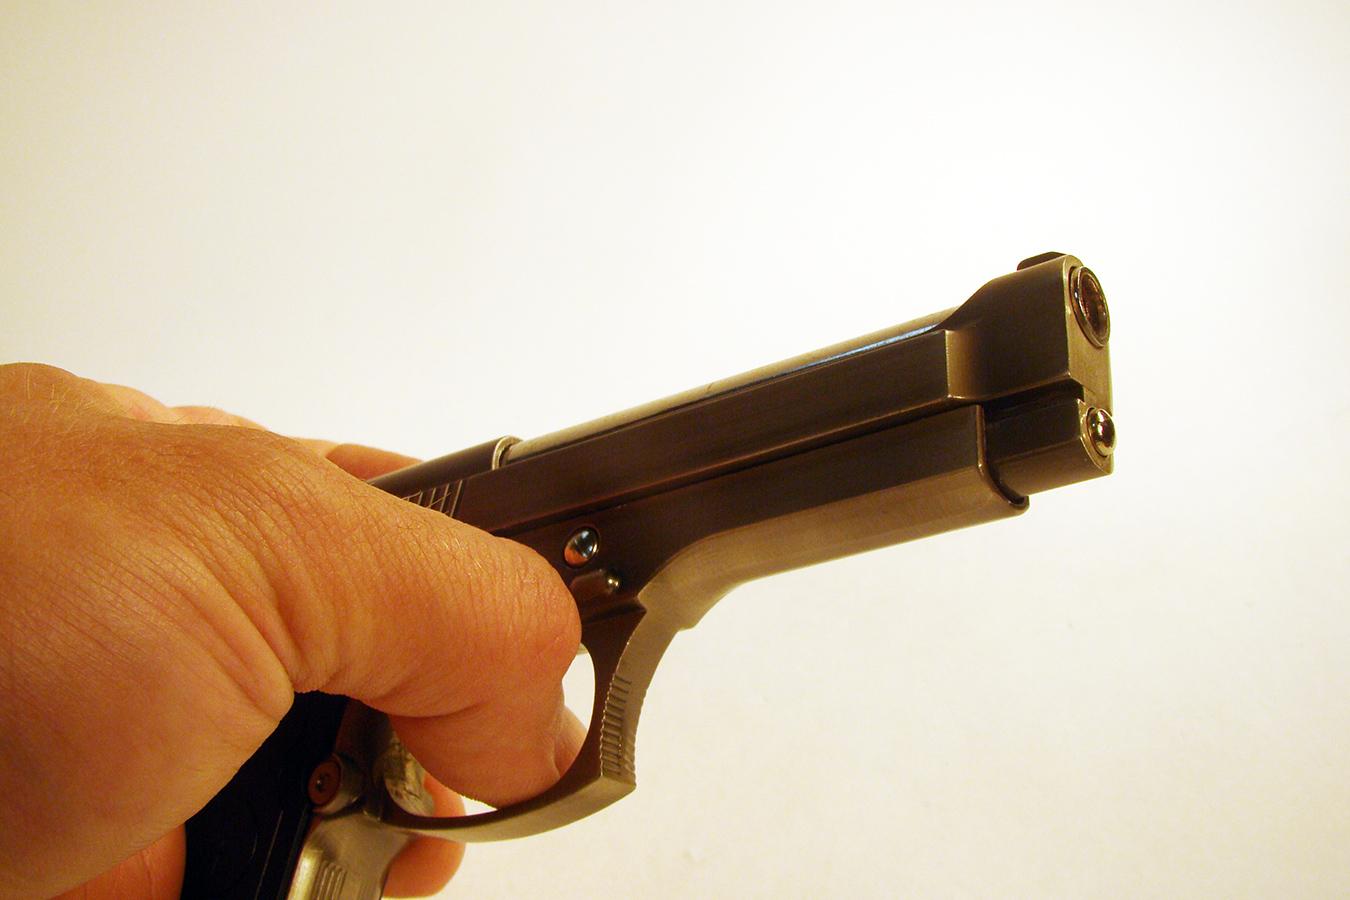 Beretta 92FS 15 см серая изображение 2